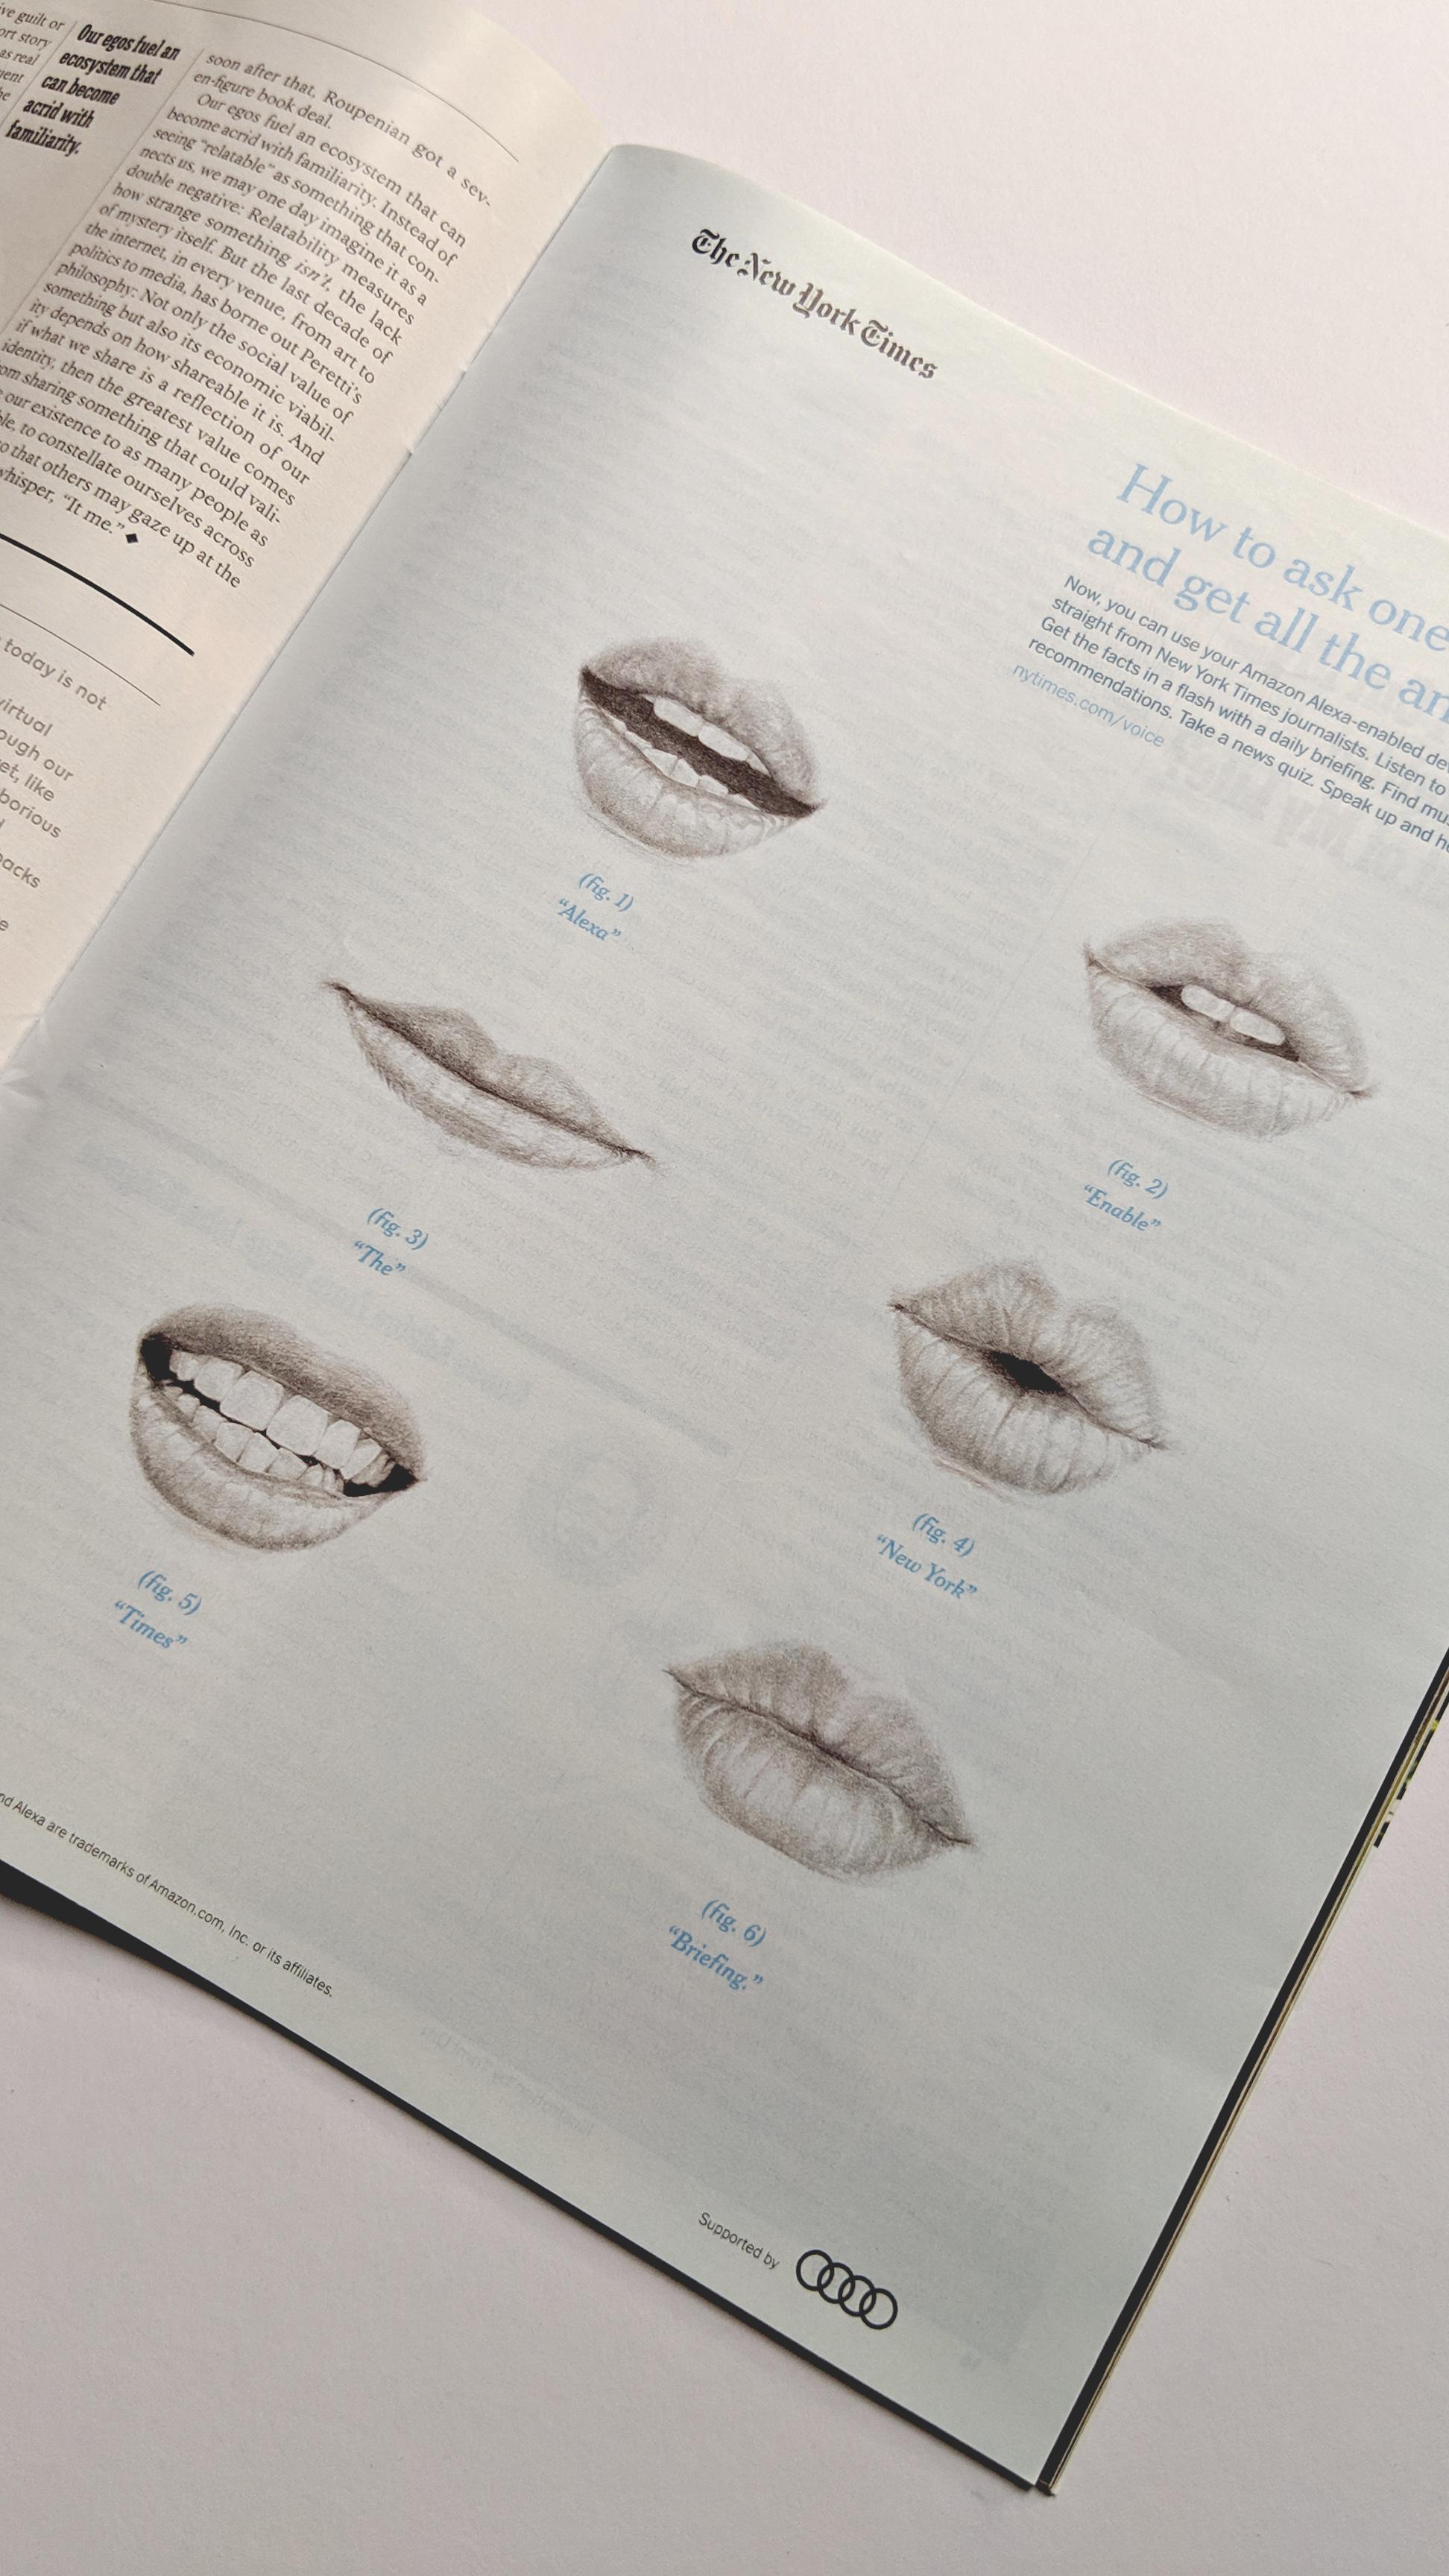 5-alexa magazine photo story.jpg